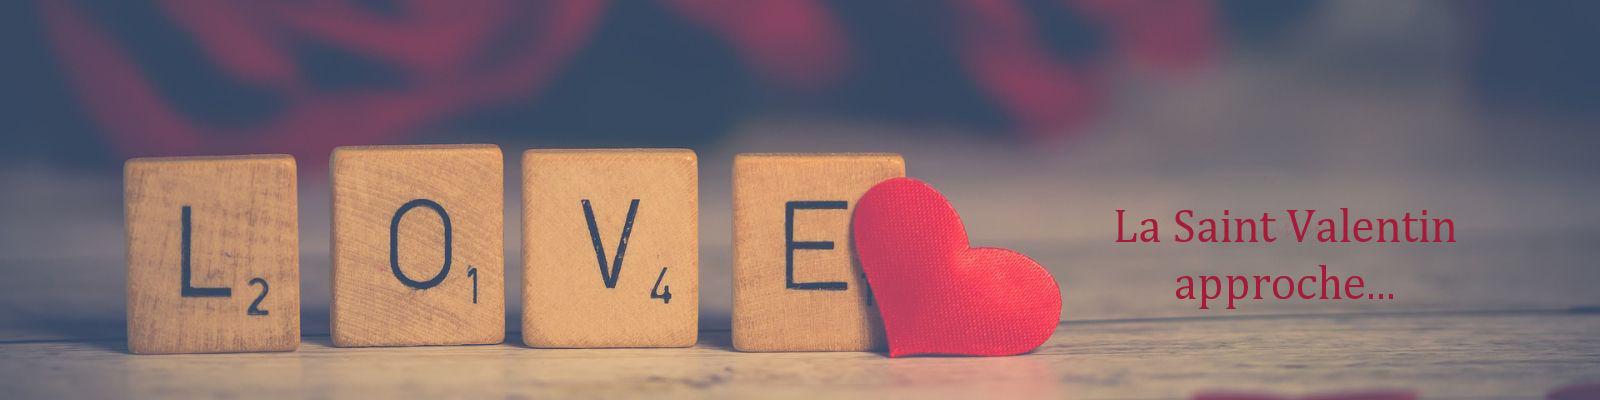 cadeau Fait main Saint Valentin